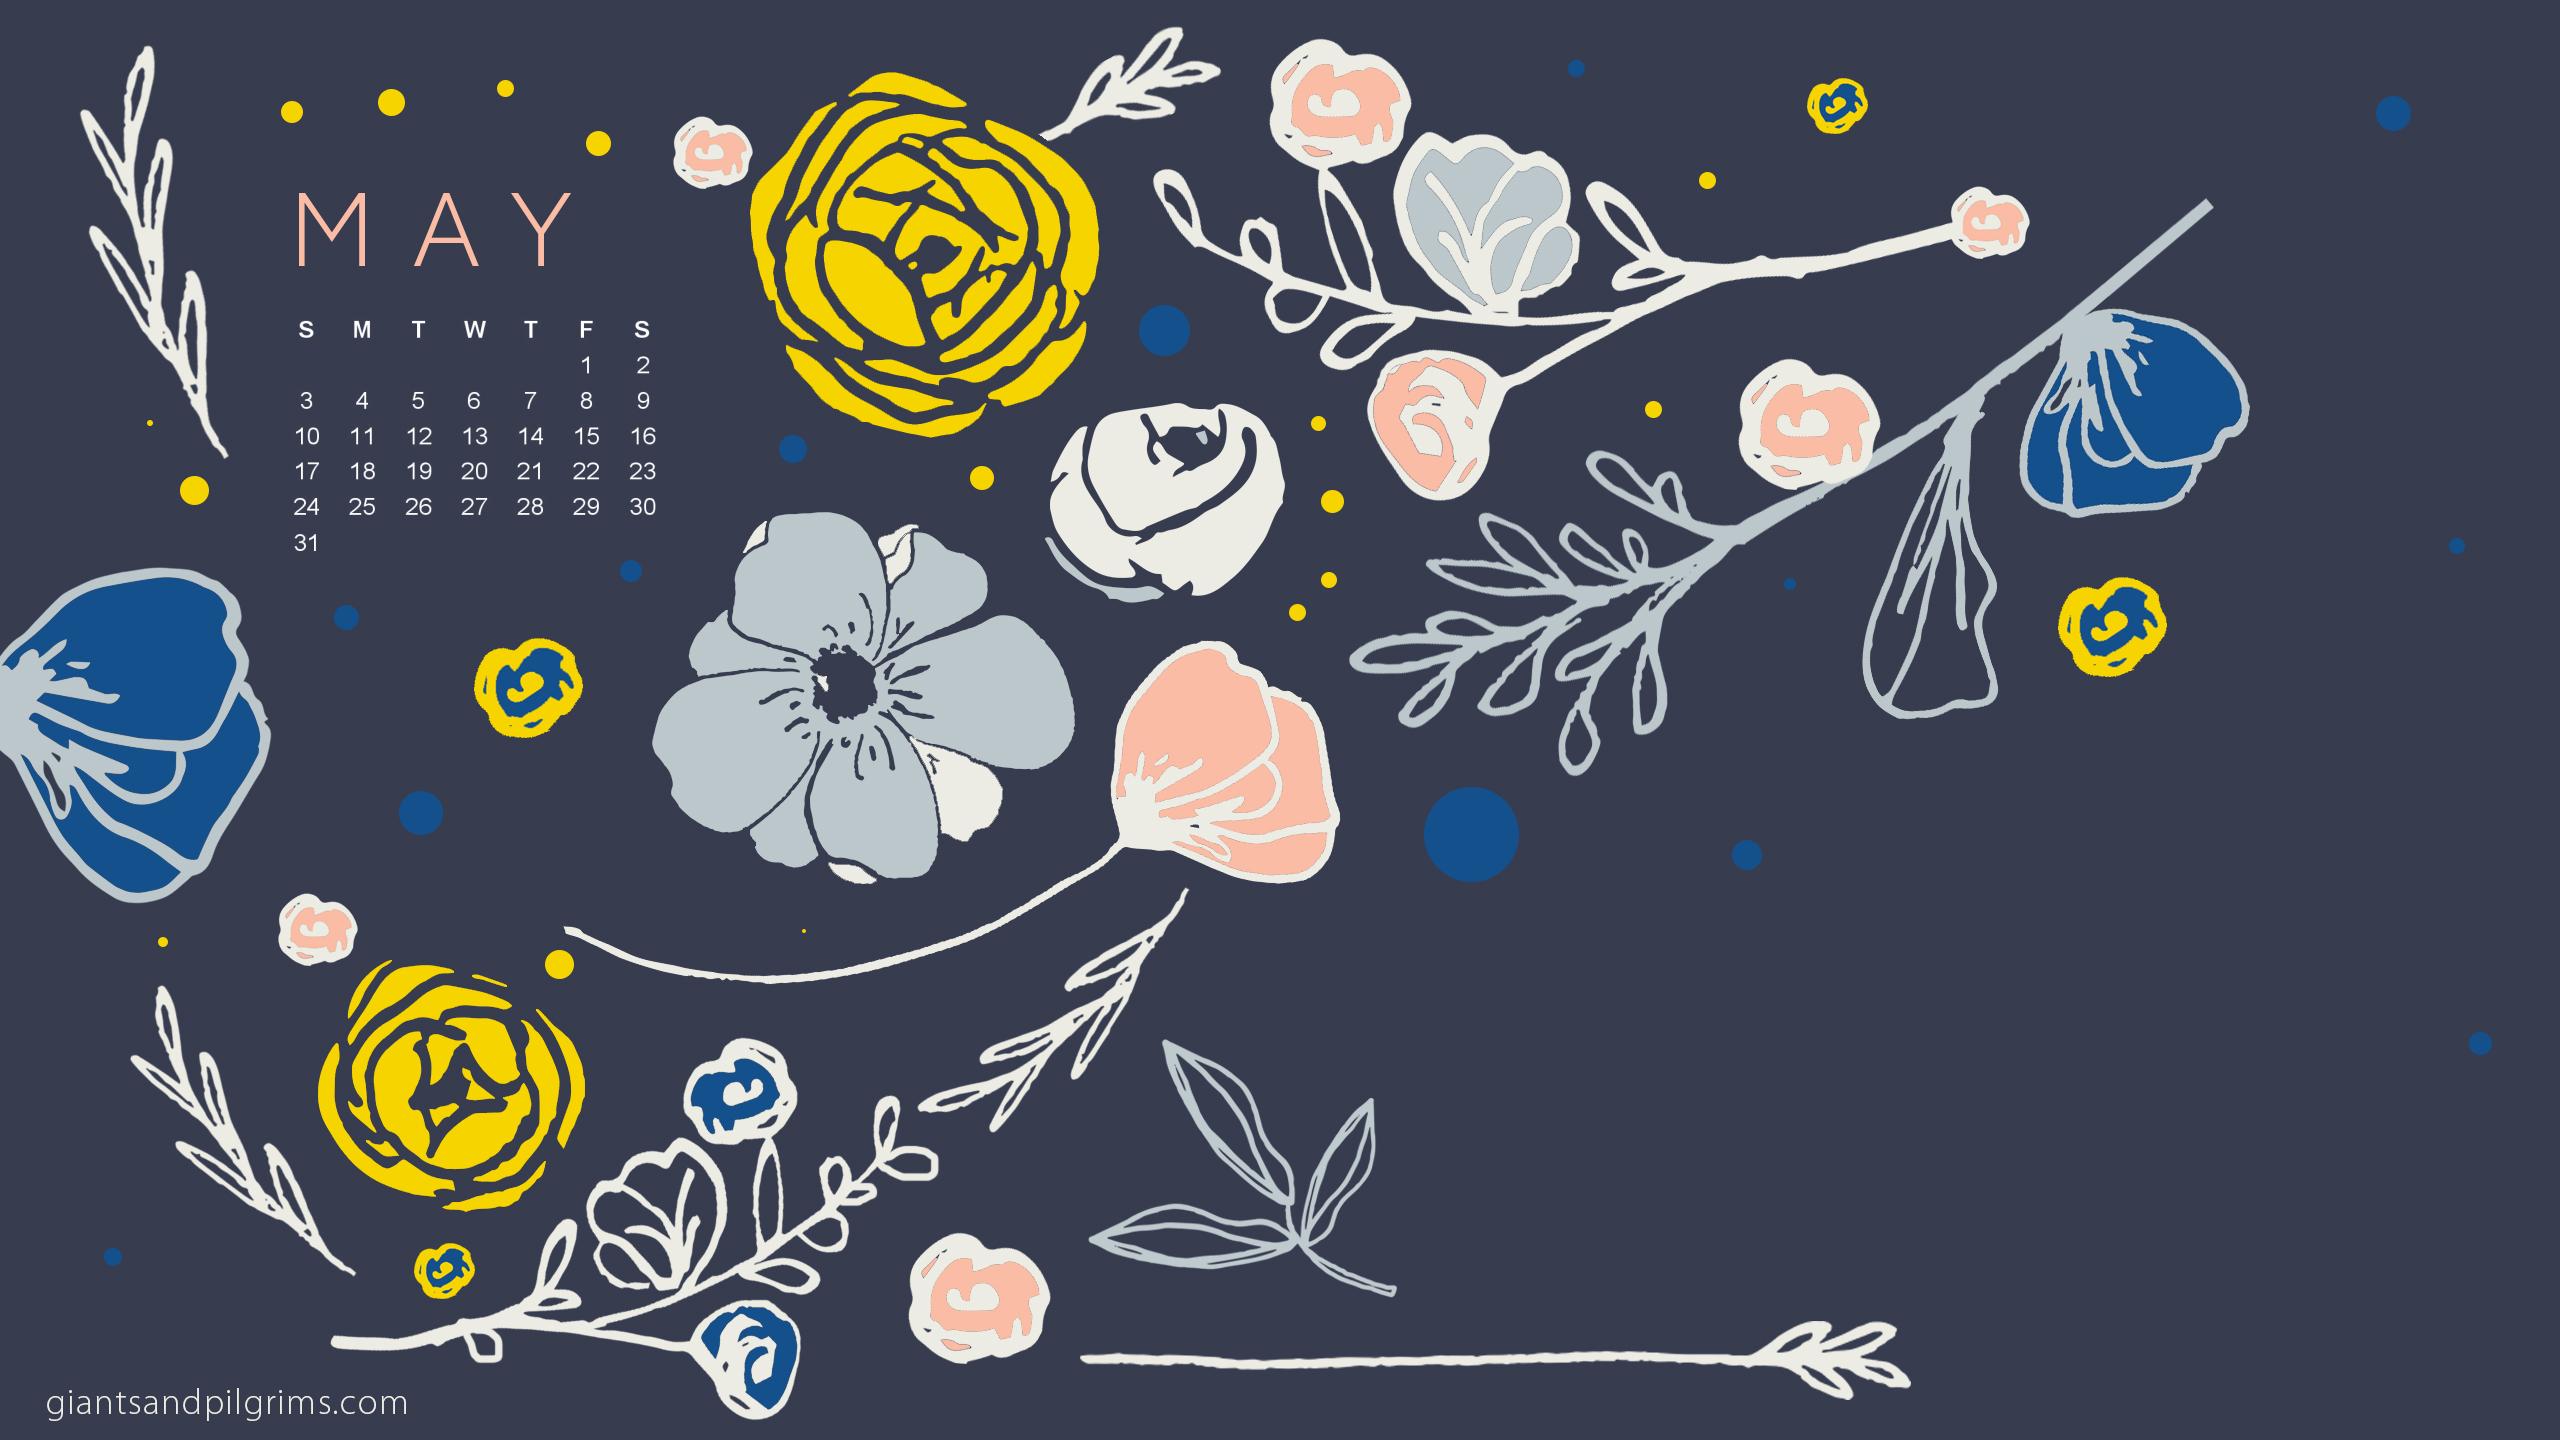 May 2015 Desktop and iPhone Wallpaper Giants Pilgrims 2560x1440